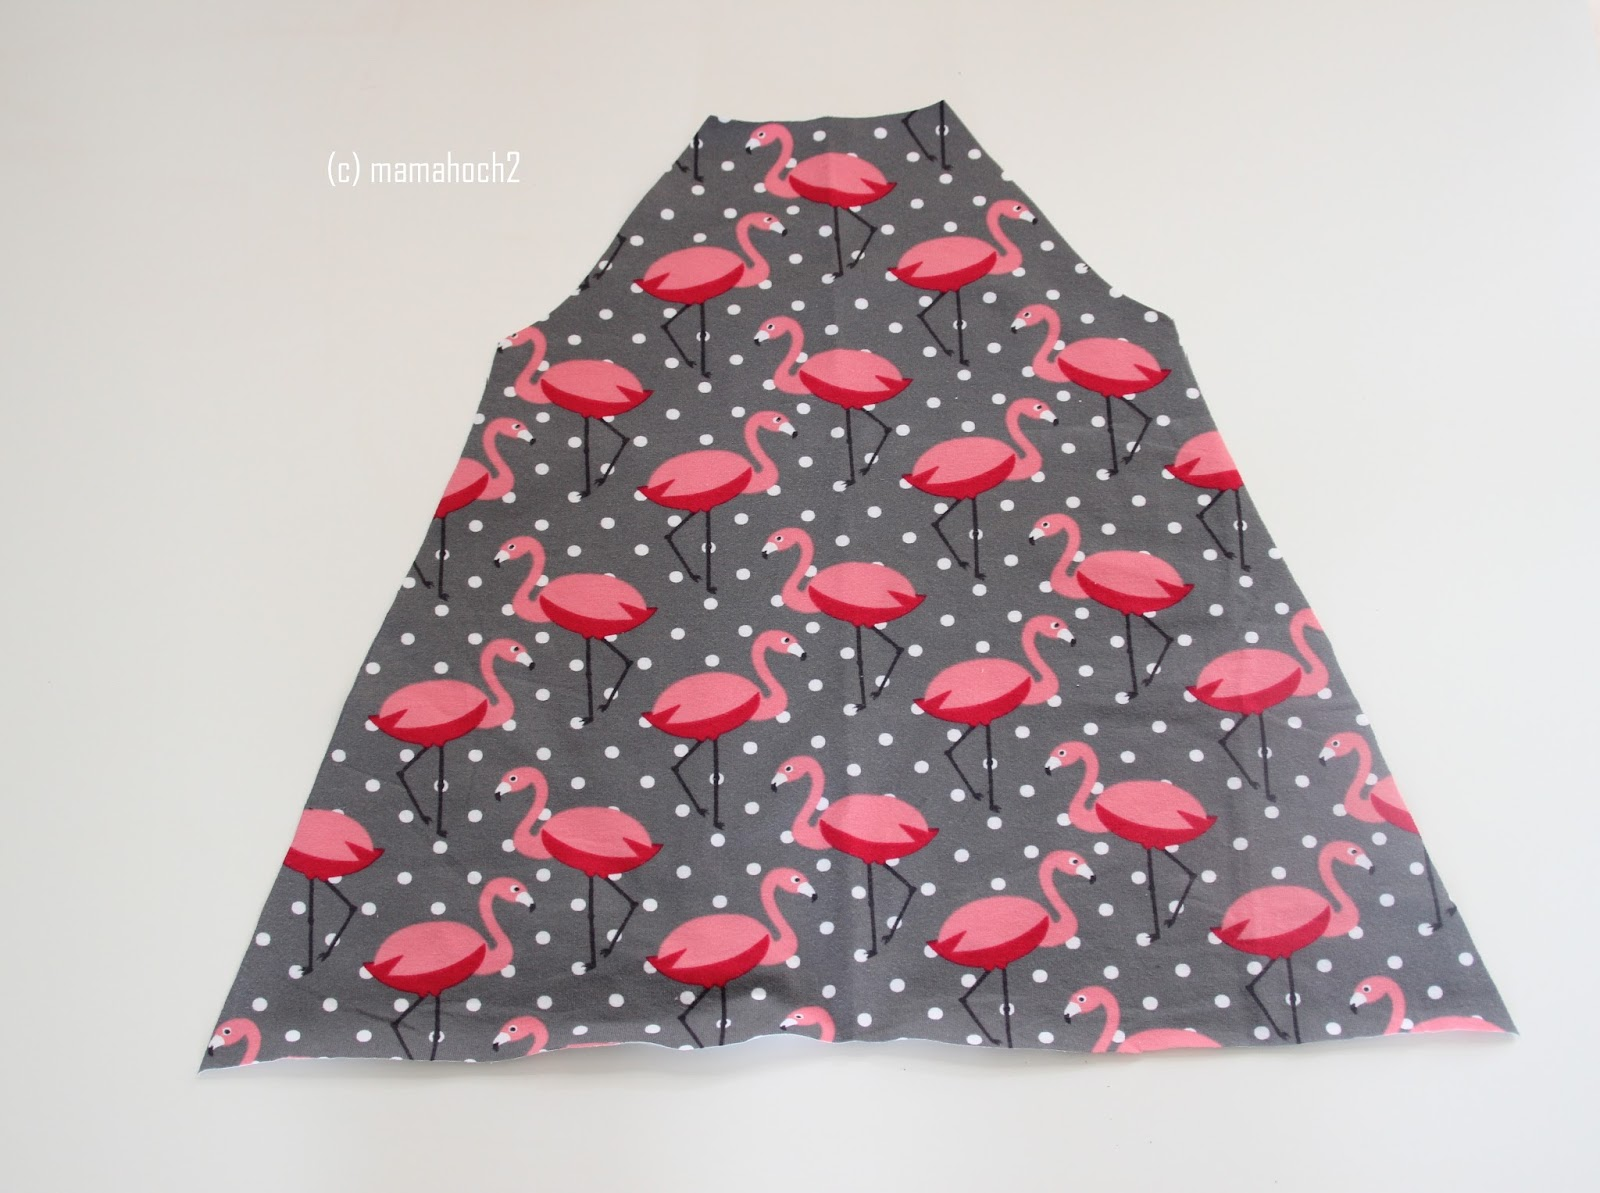 Raglan Tunika oder A-Form-Kleid ⋆ Mamahoch2